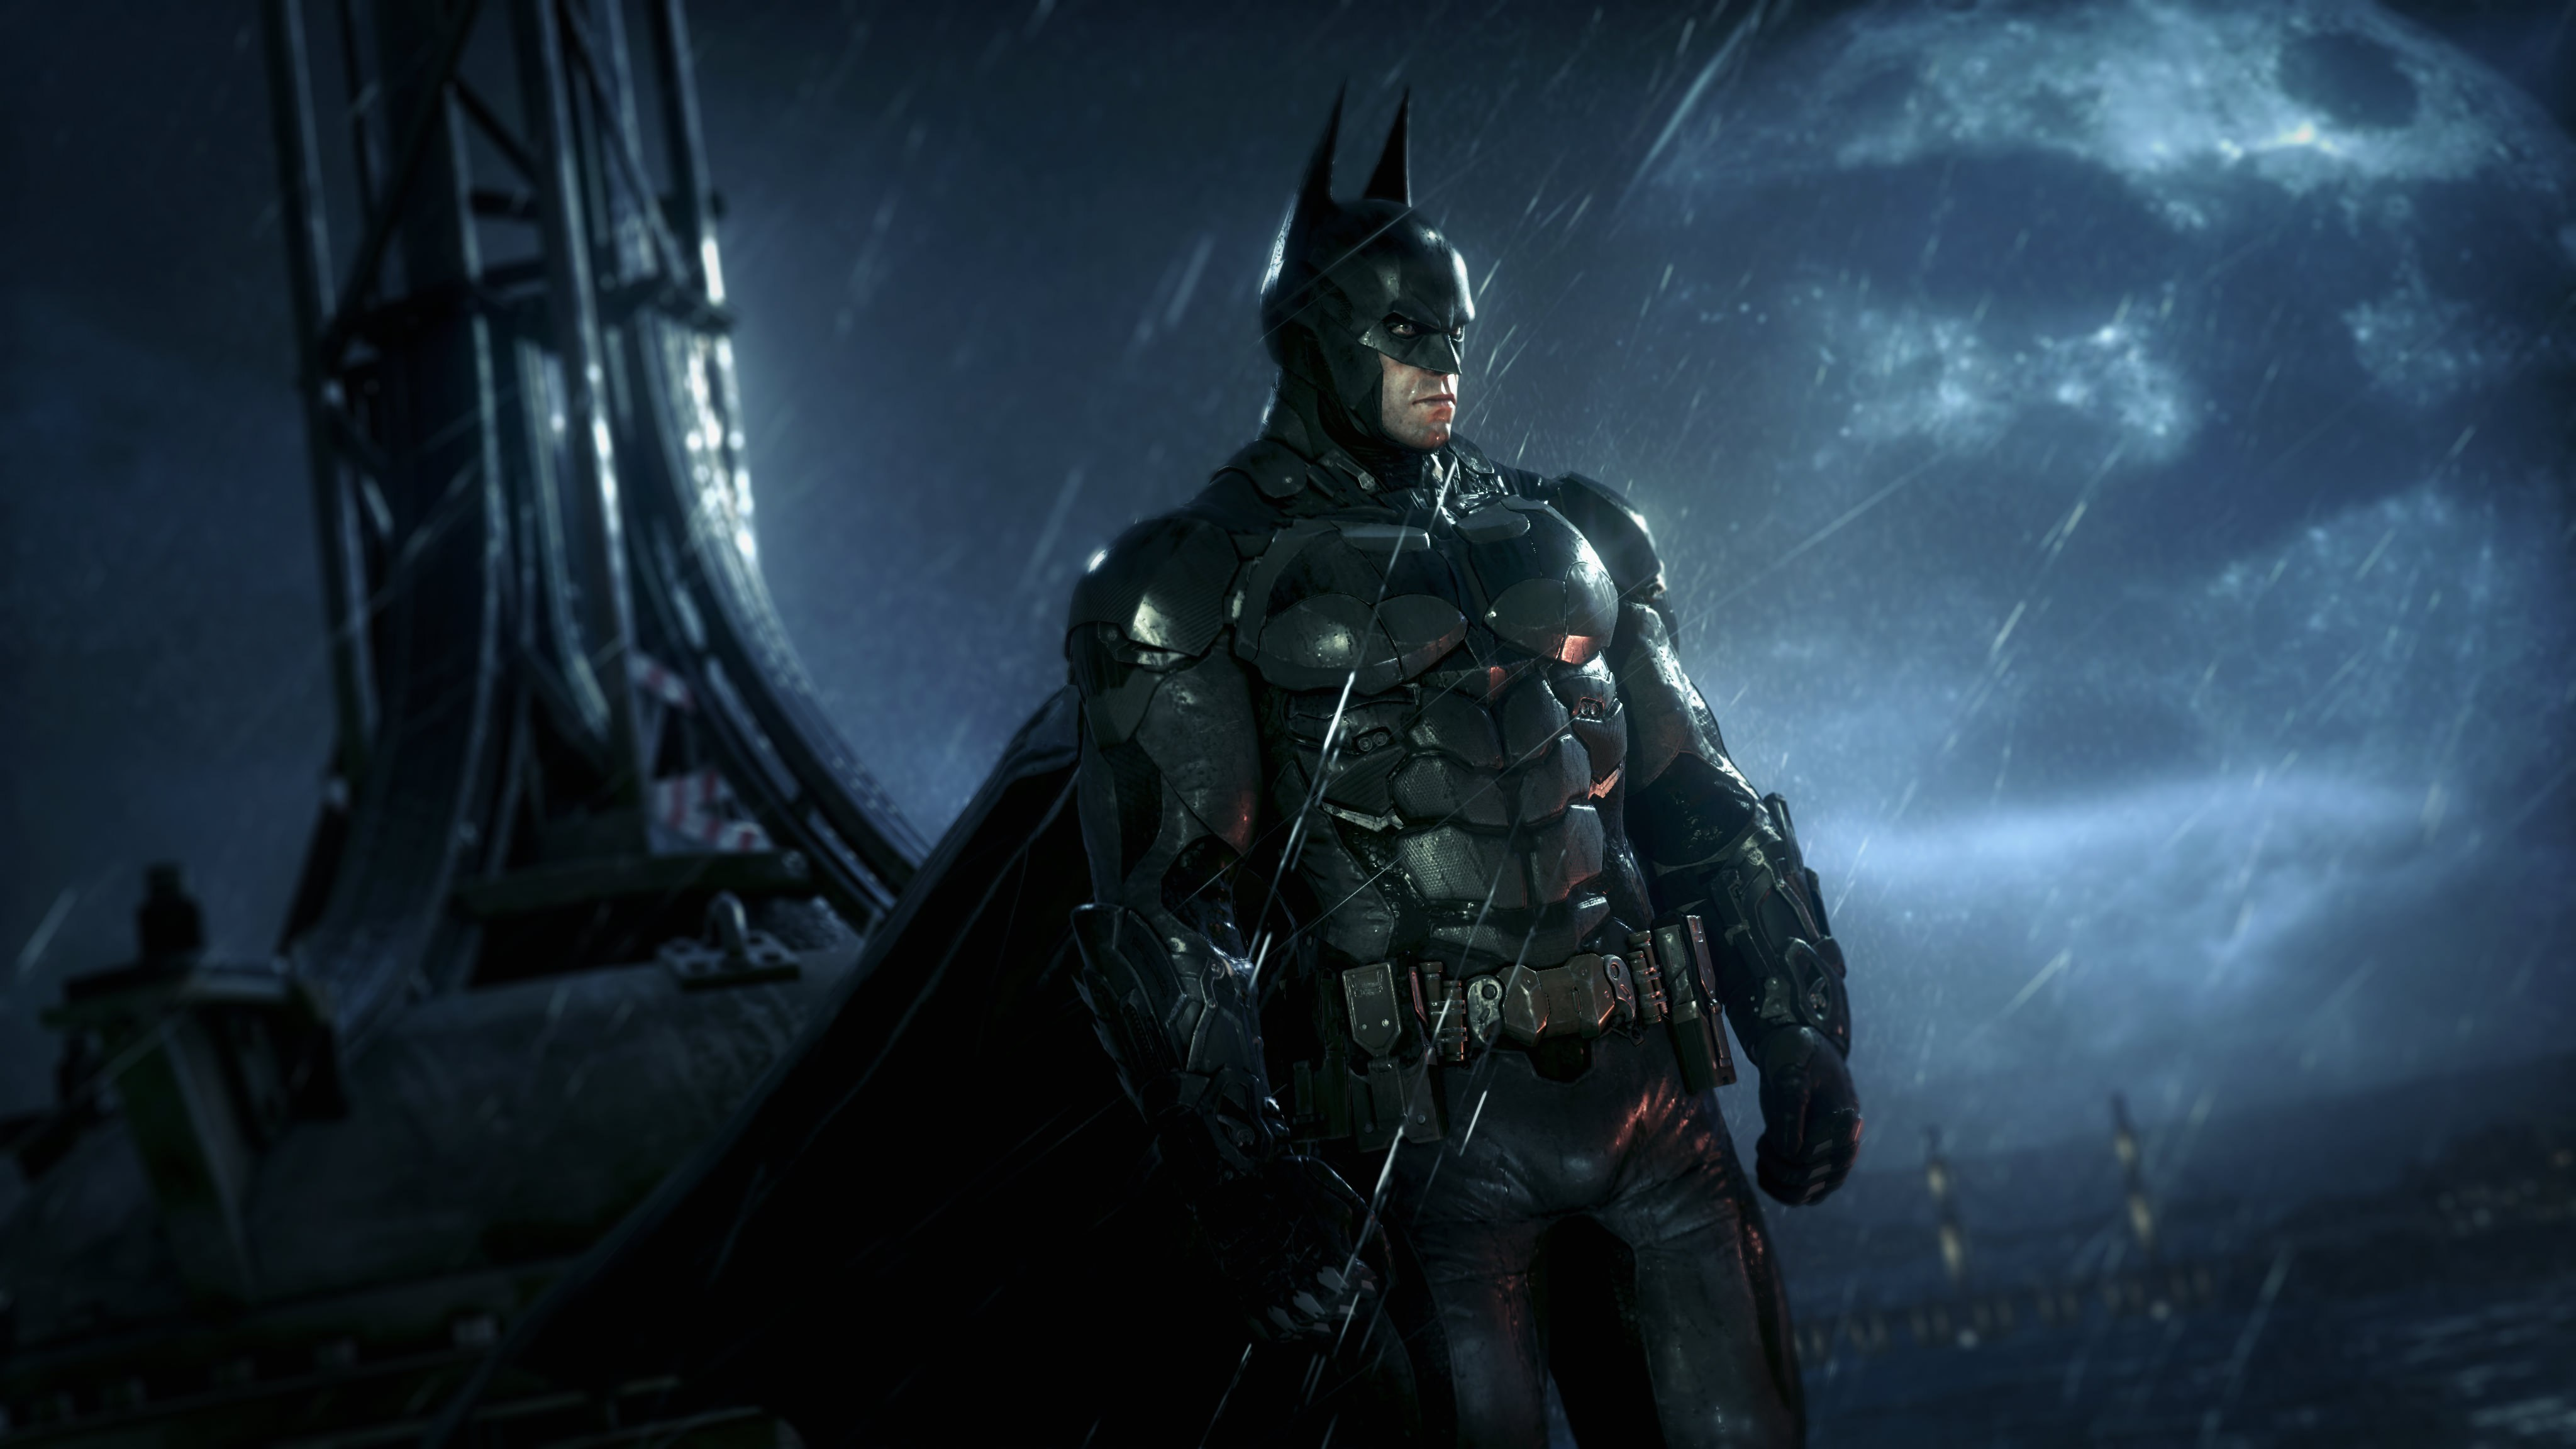 4k Batman Arkham Origins Hd Games 4k Wallpapers Images